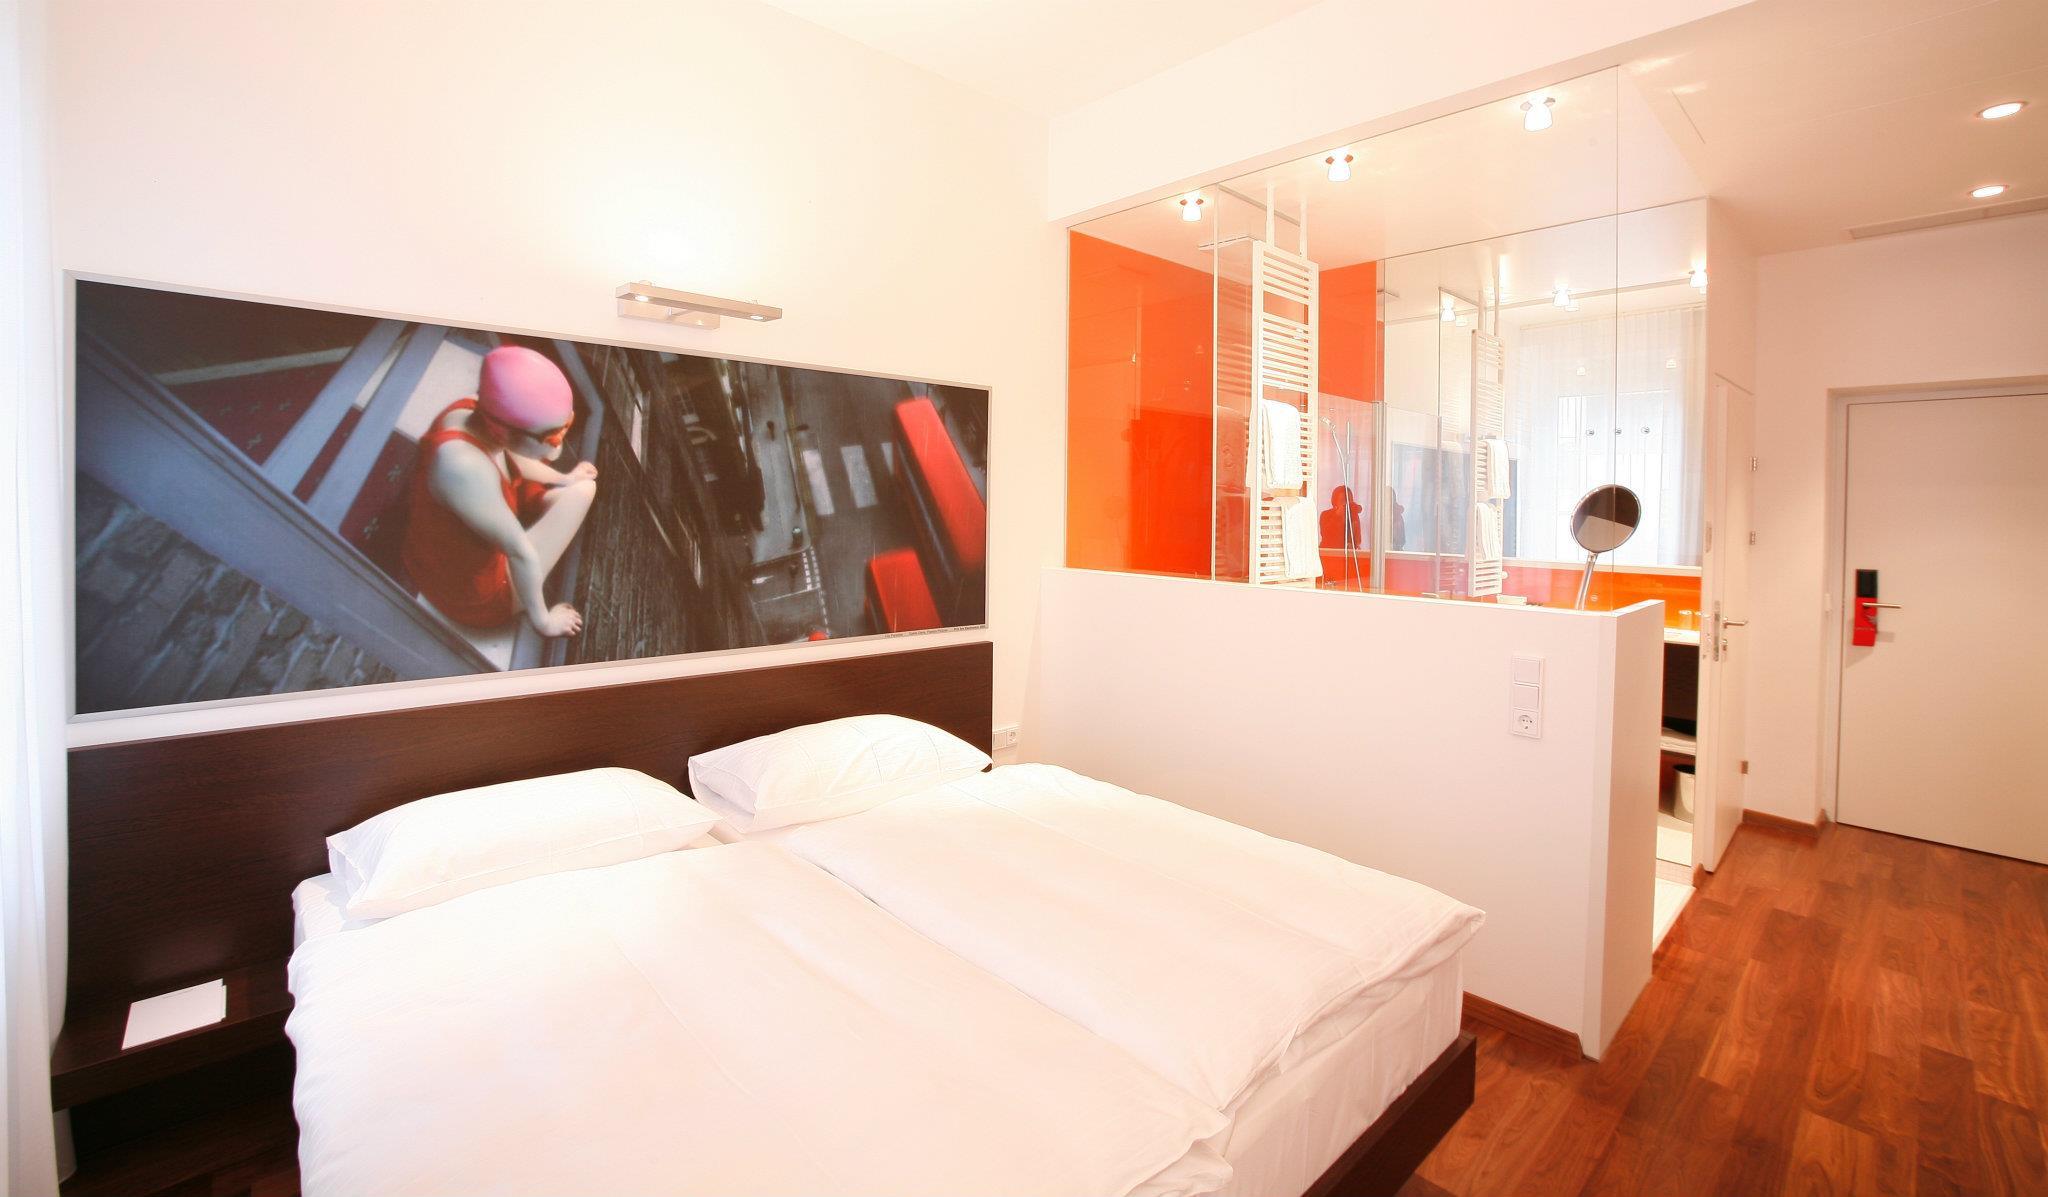 Spitz Hotel in Linz